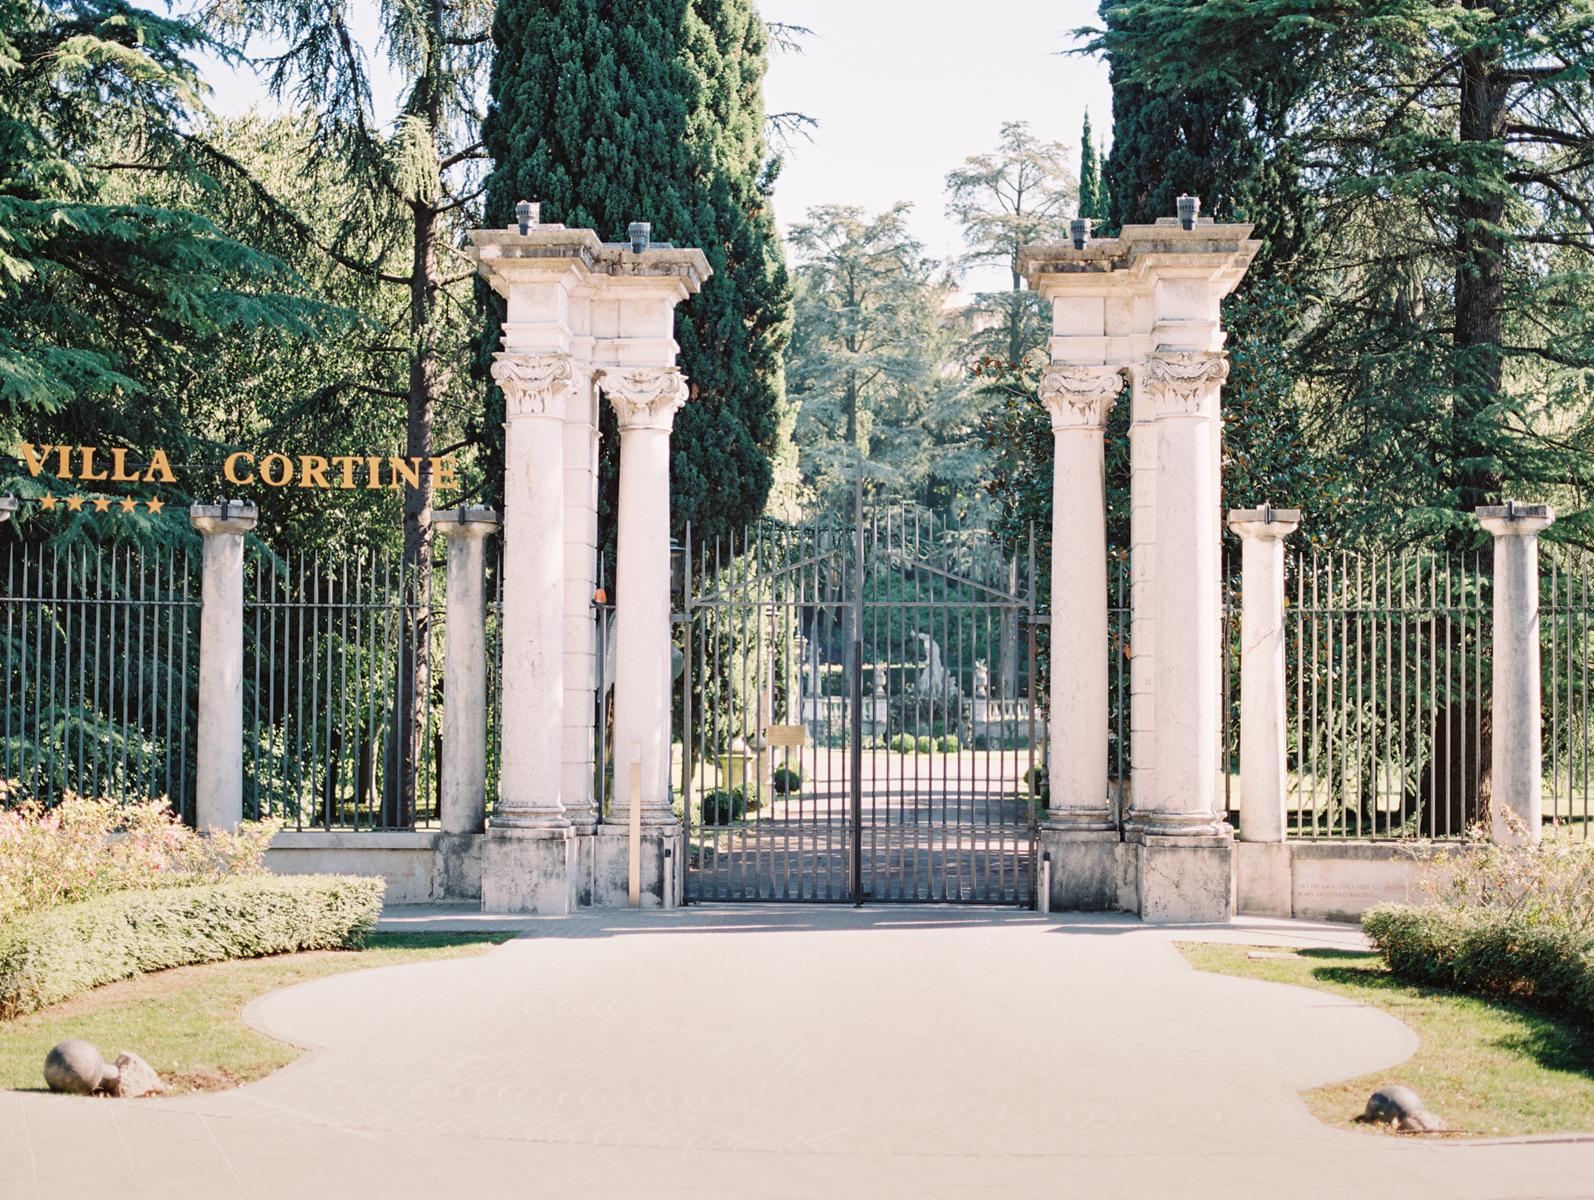 Palace_Villa_Cortine_Hotel_Italian_Wedding_Photographer_Sirmione_AKP-1-Nicole_Khudoyan_Mitchell_Kapoor.jpg